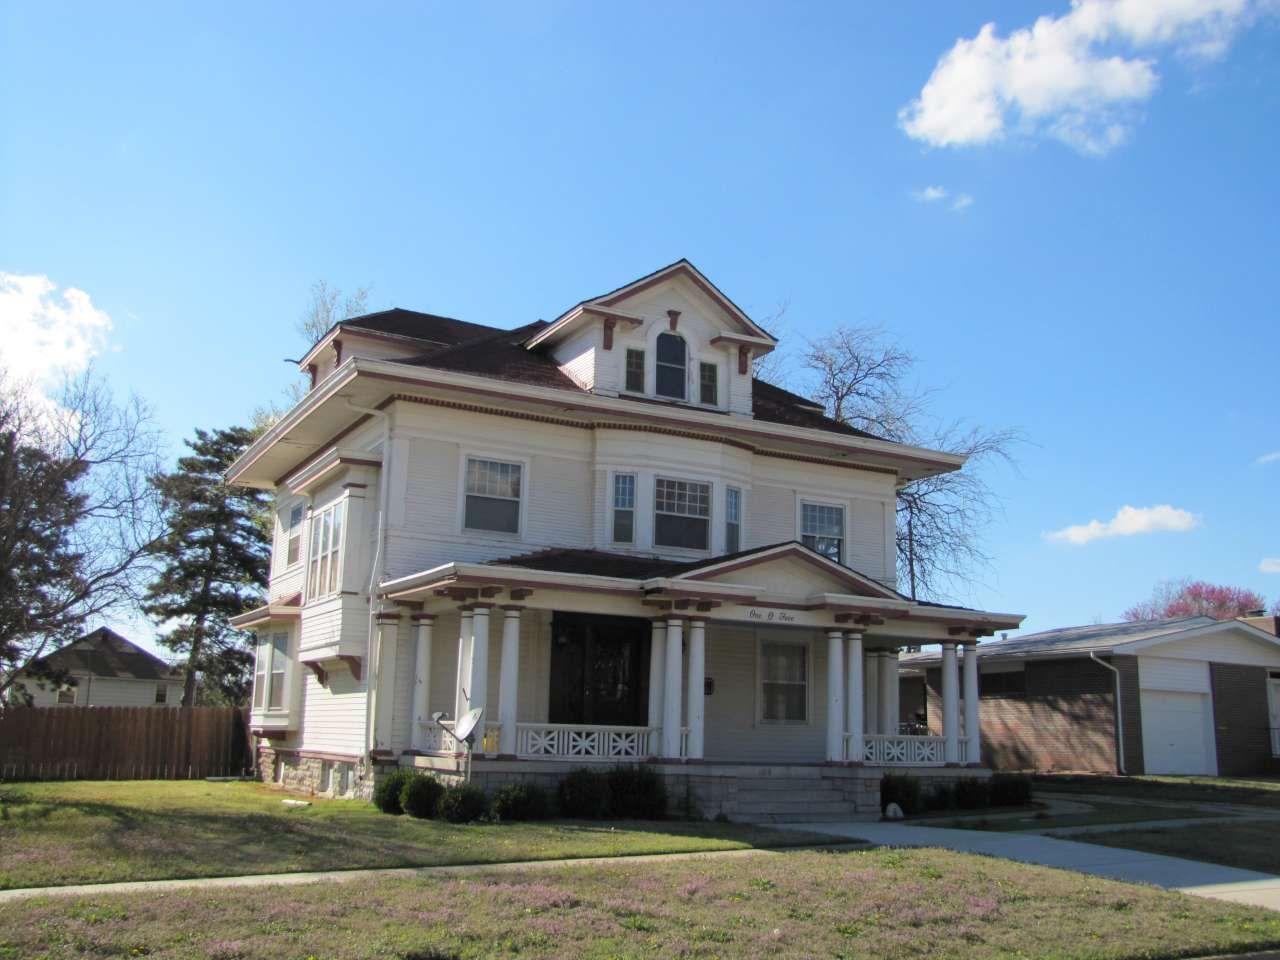 S.P. Gebhart House in Pratt County, Kansas.